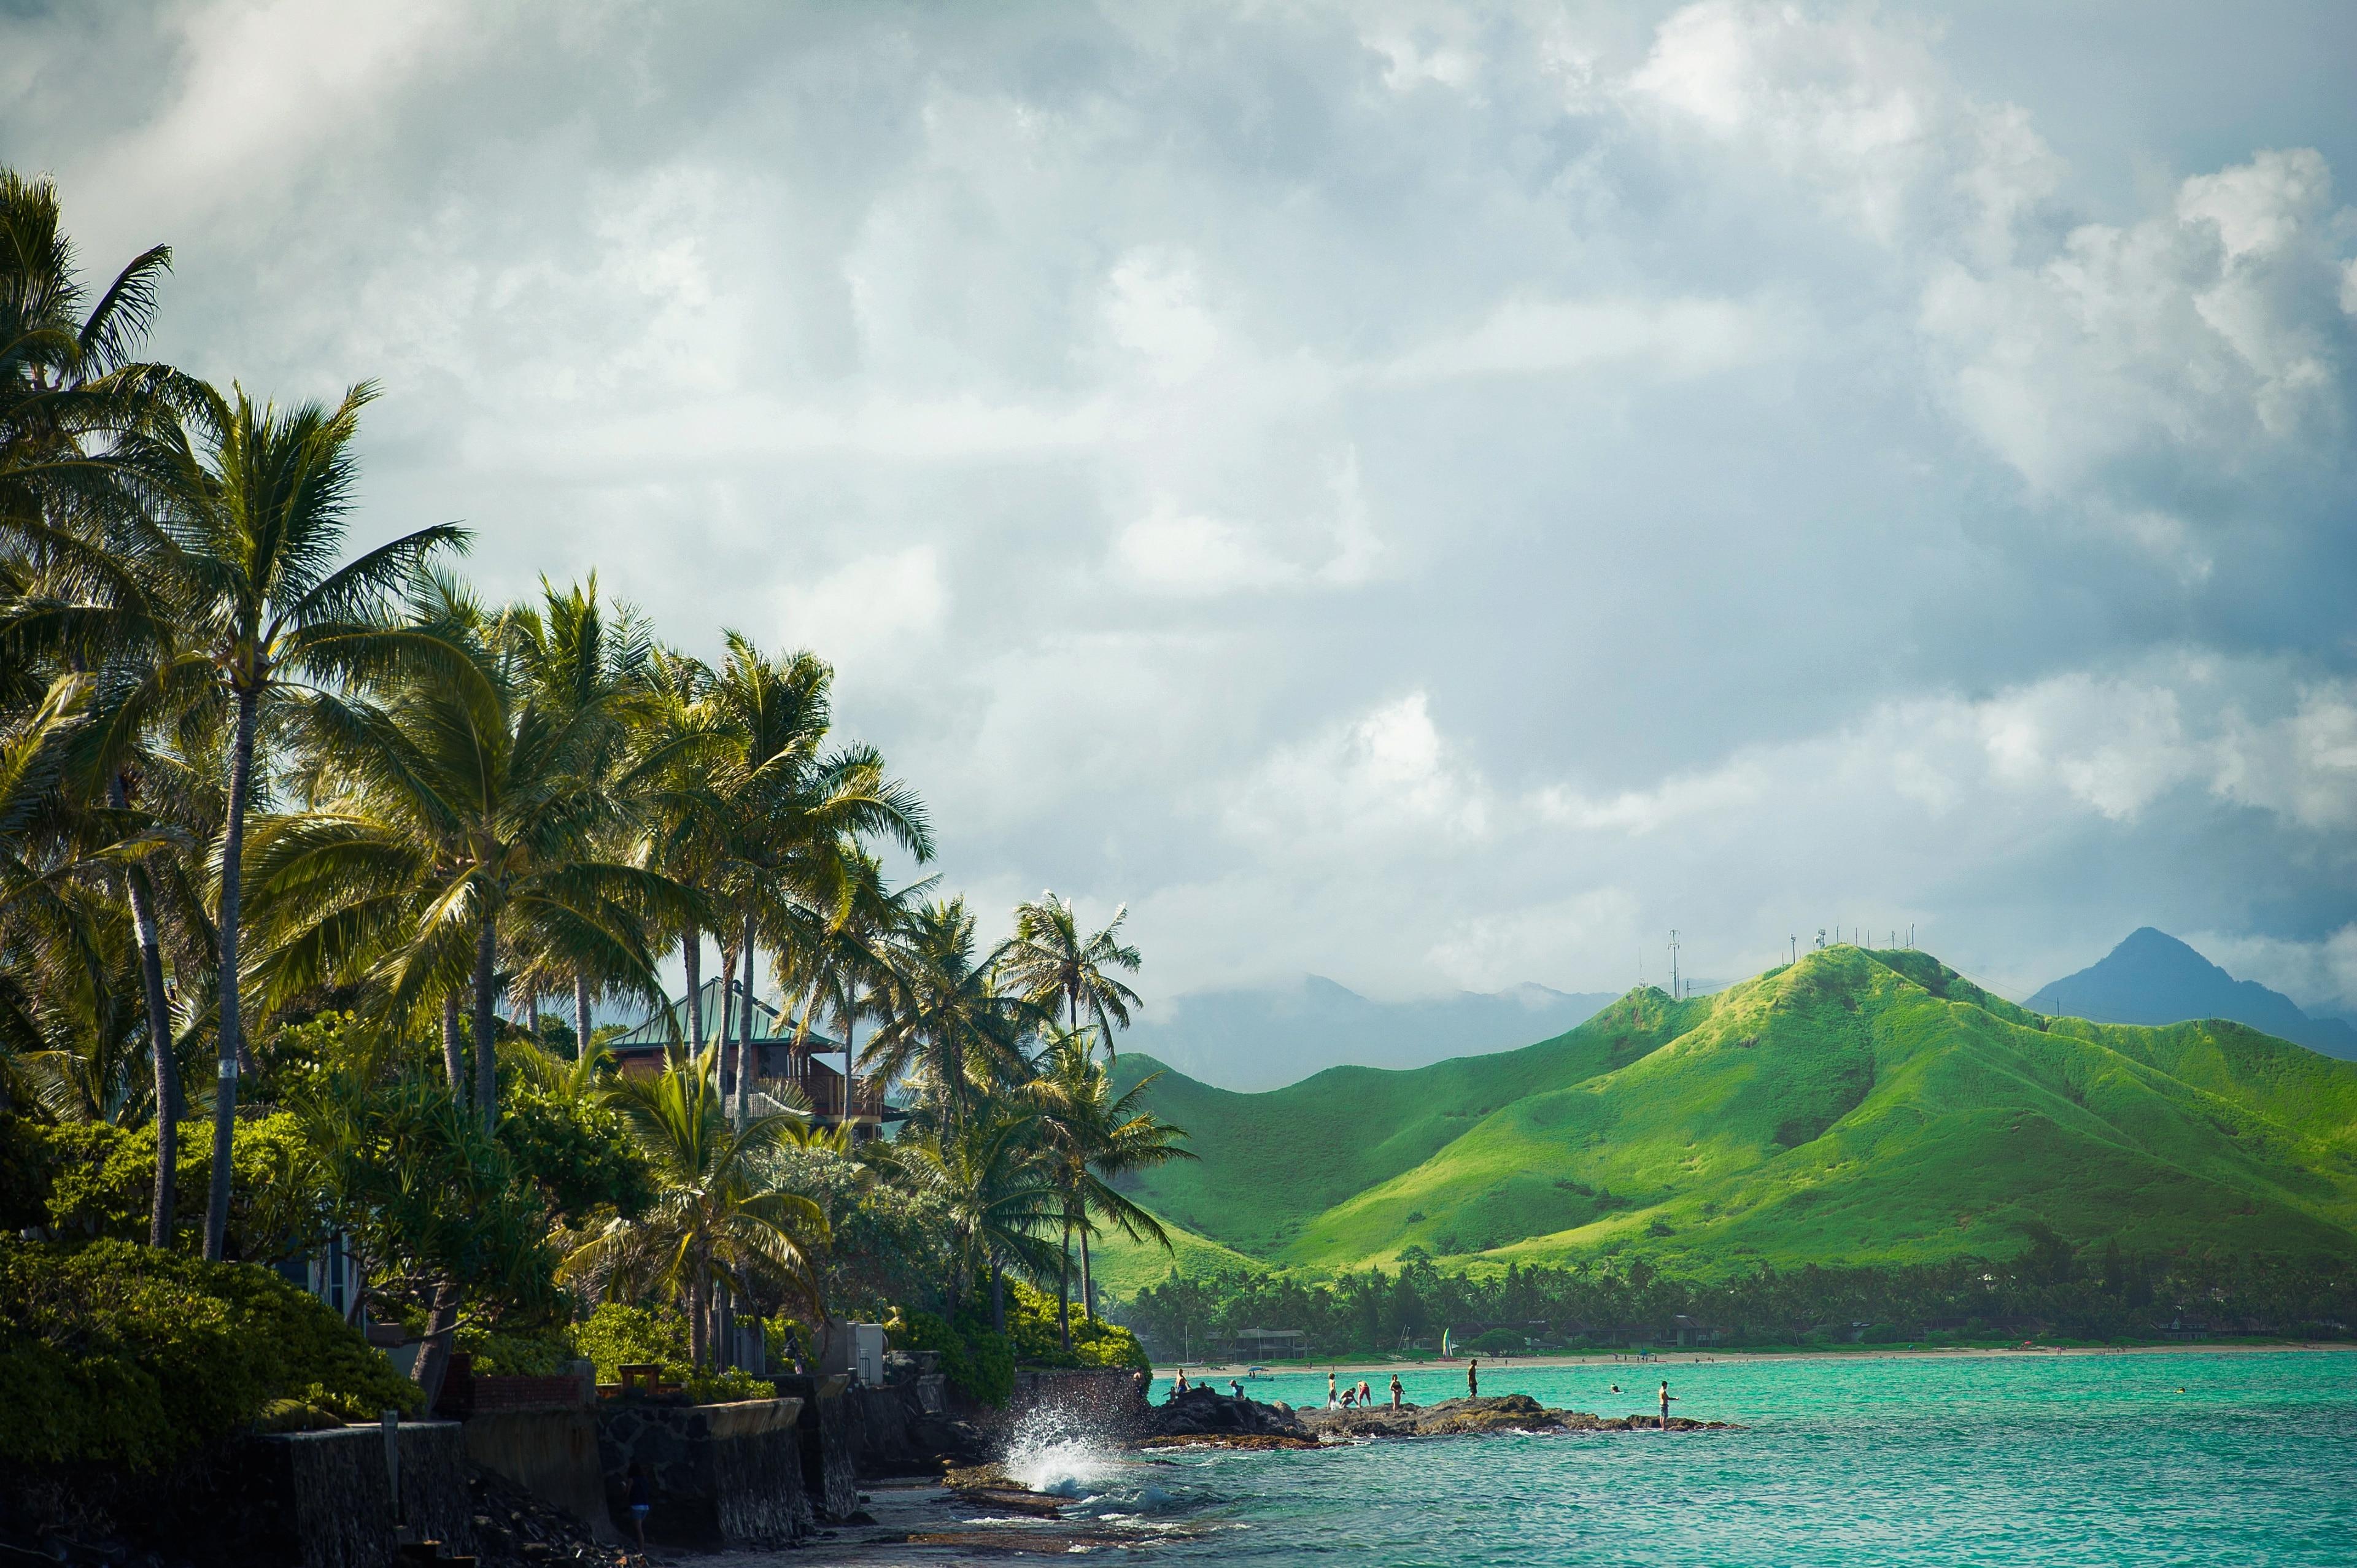 Lanikai Beach, Kailua, Hawaii, United States of America